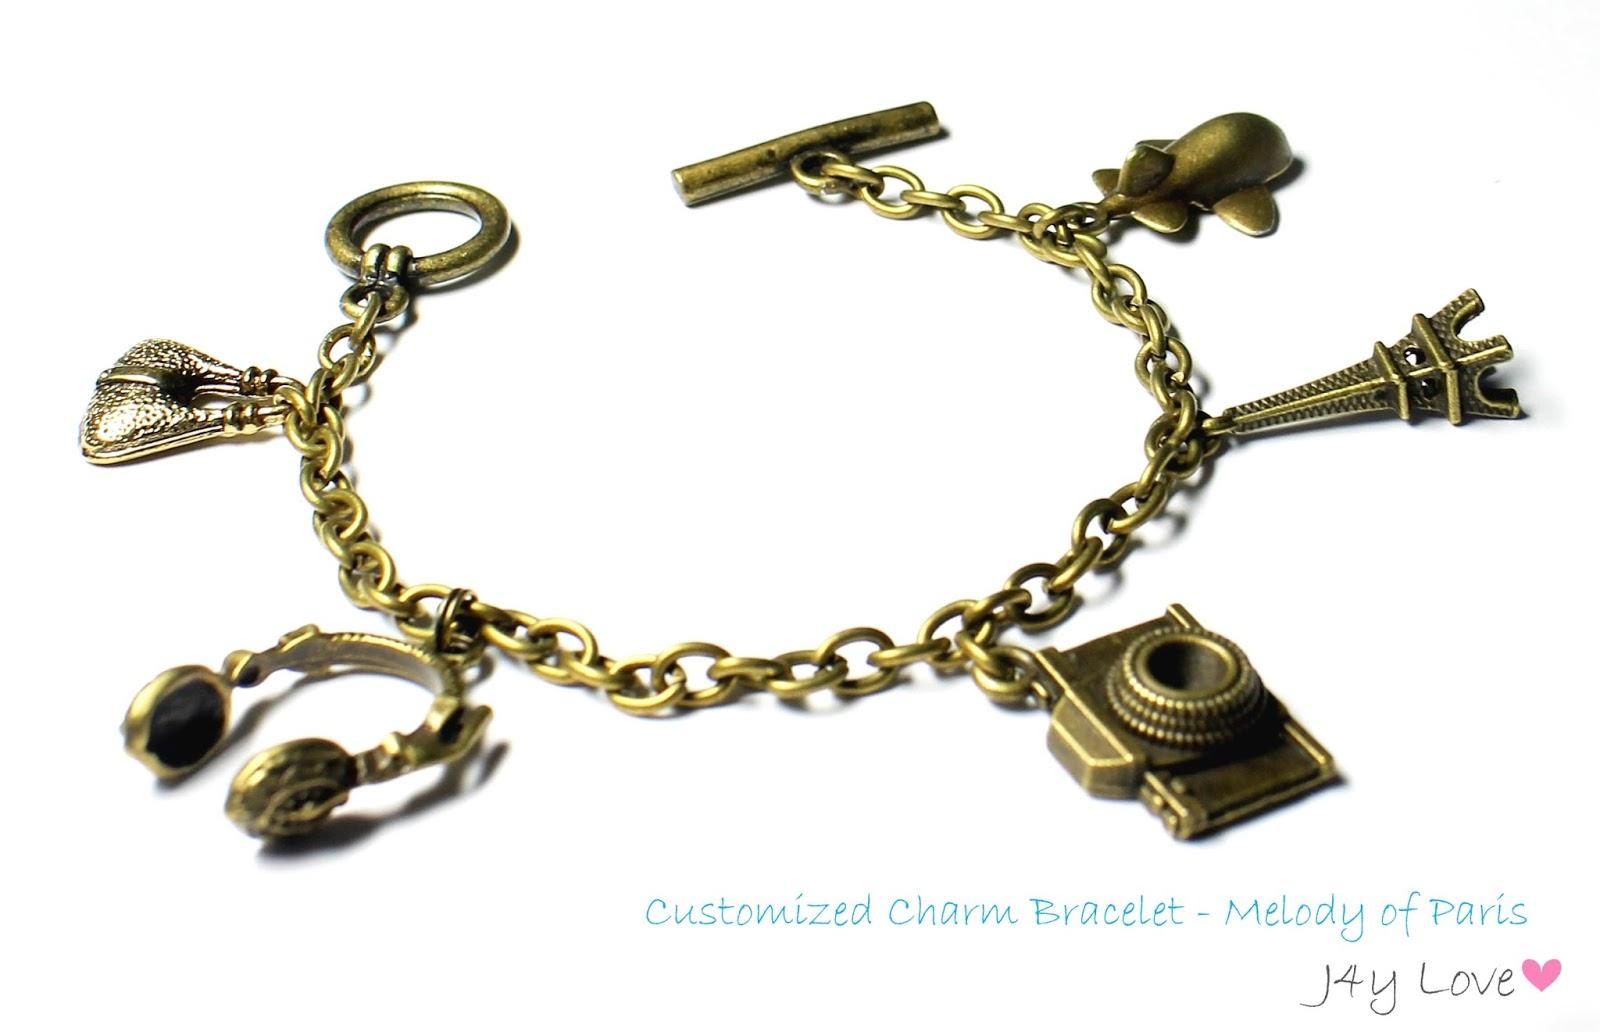 Item Name: Customized Charm Bracelet  Melody Of Paris